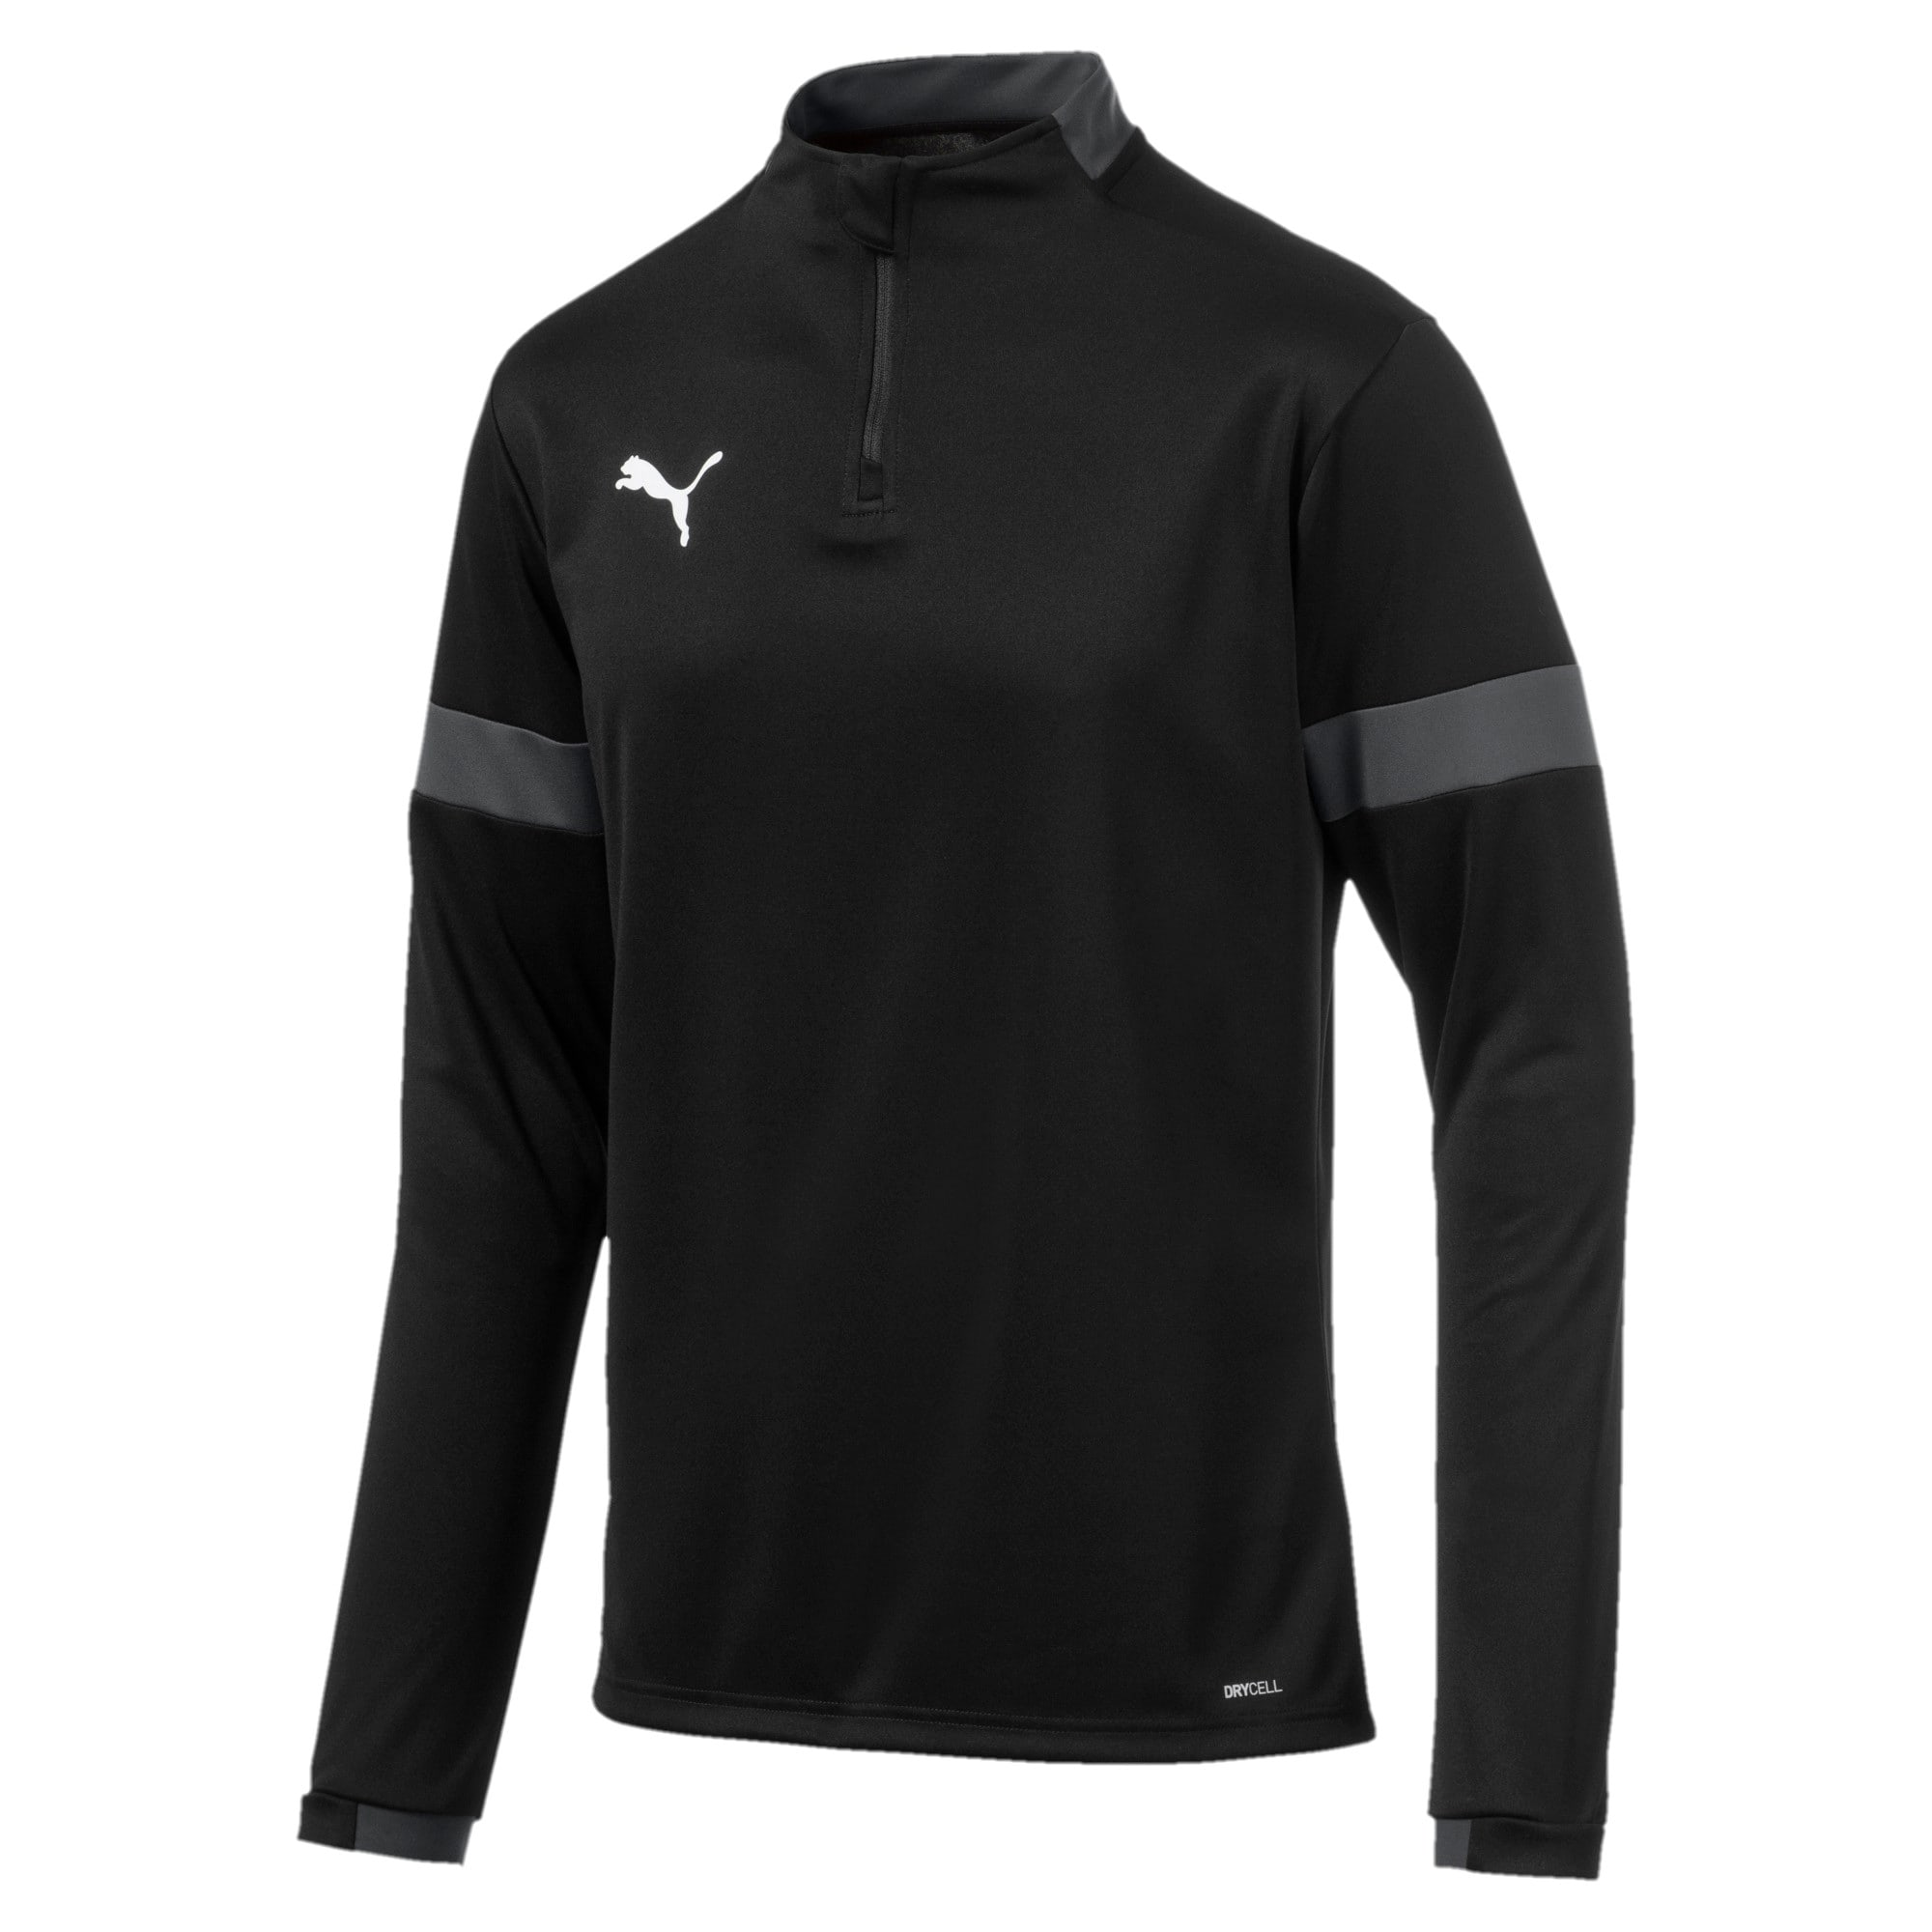 Thumbnail 4 of Sweatshirt pour homme, Puma Black-Asphalt, medium